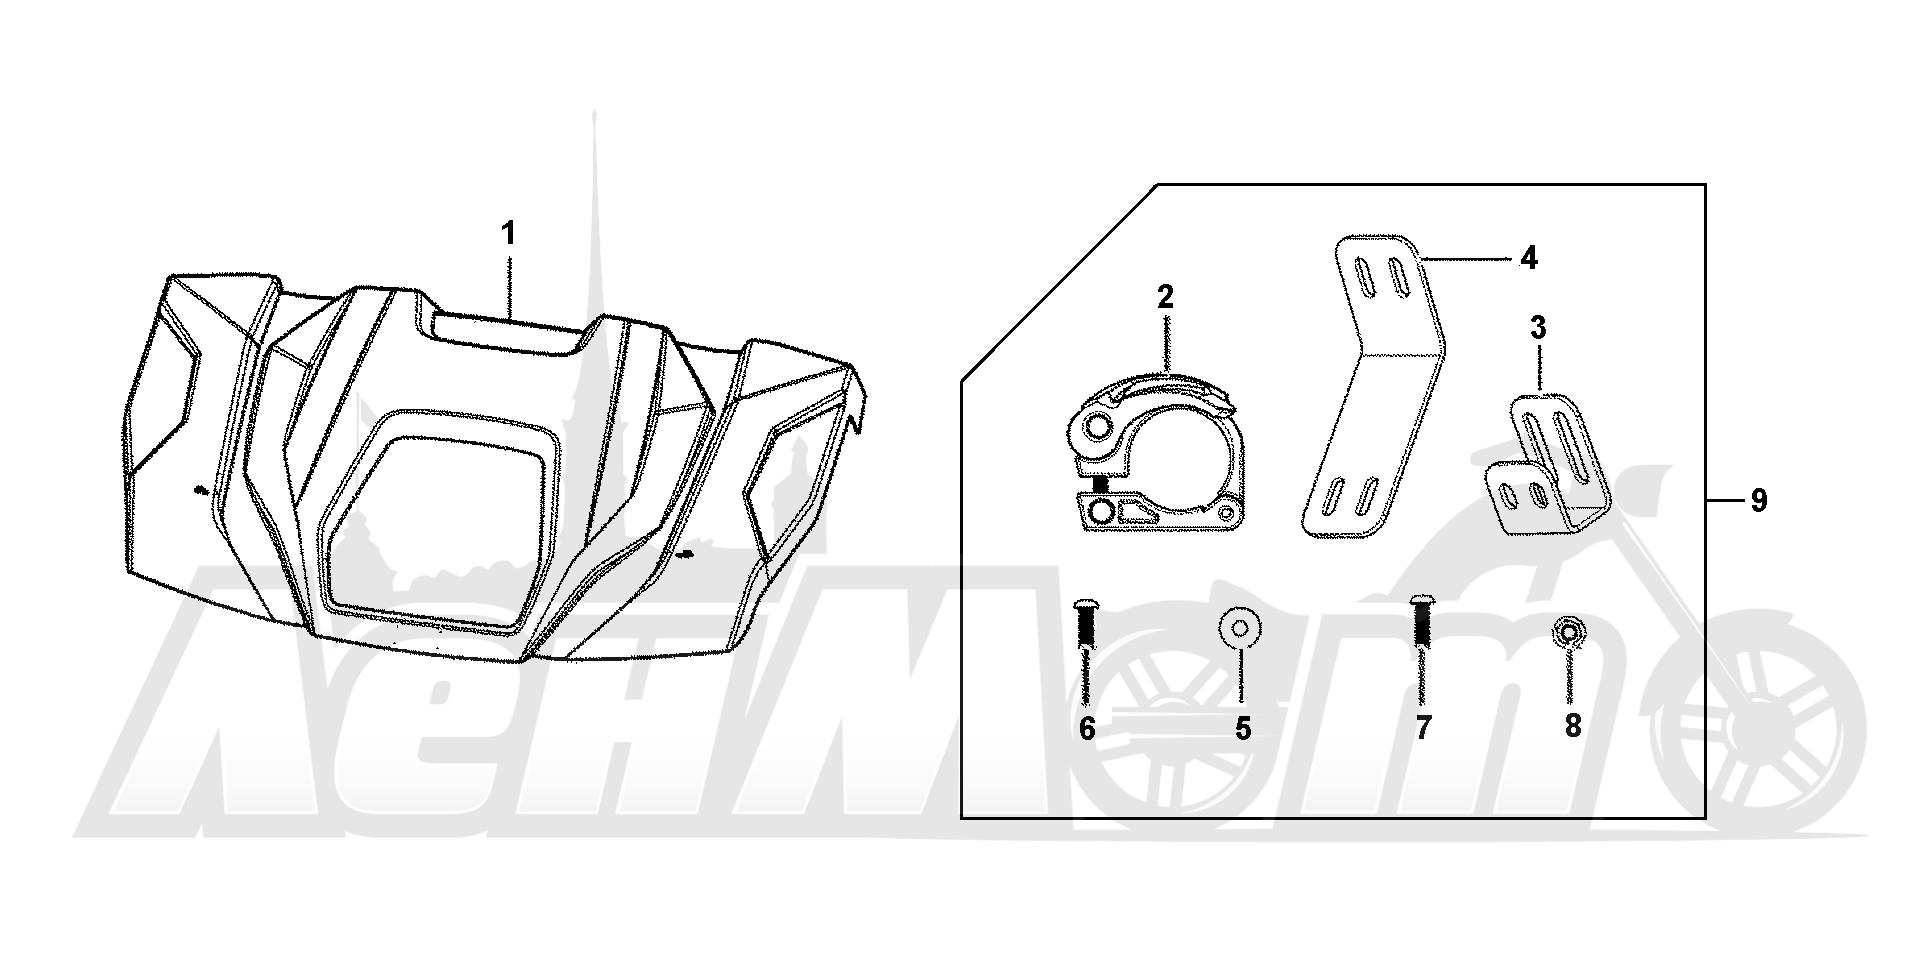 Запчасти для Квадроцикла Honda 2019 SXS1000M3L Раздел: HARD ROOF (3P) | HARD крыша (3P)